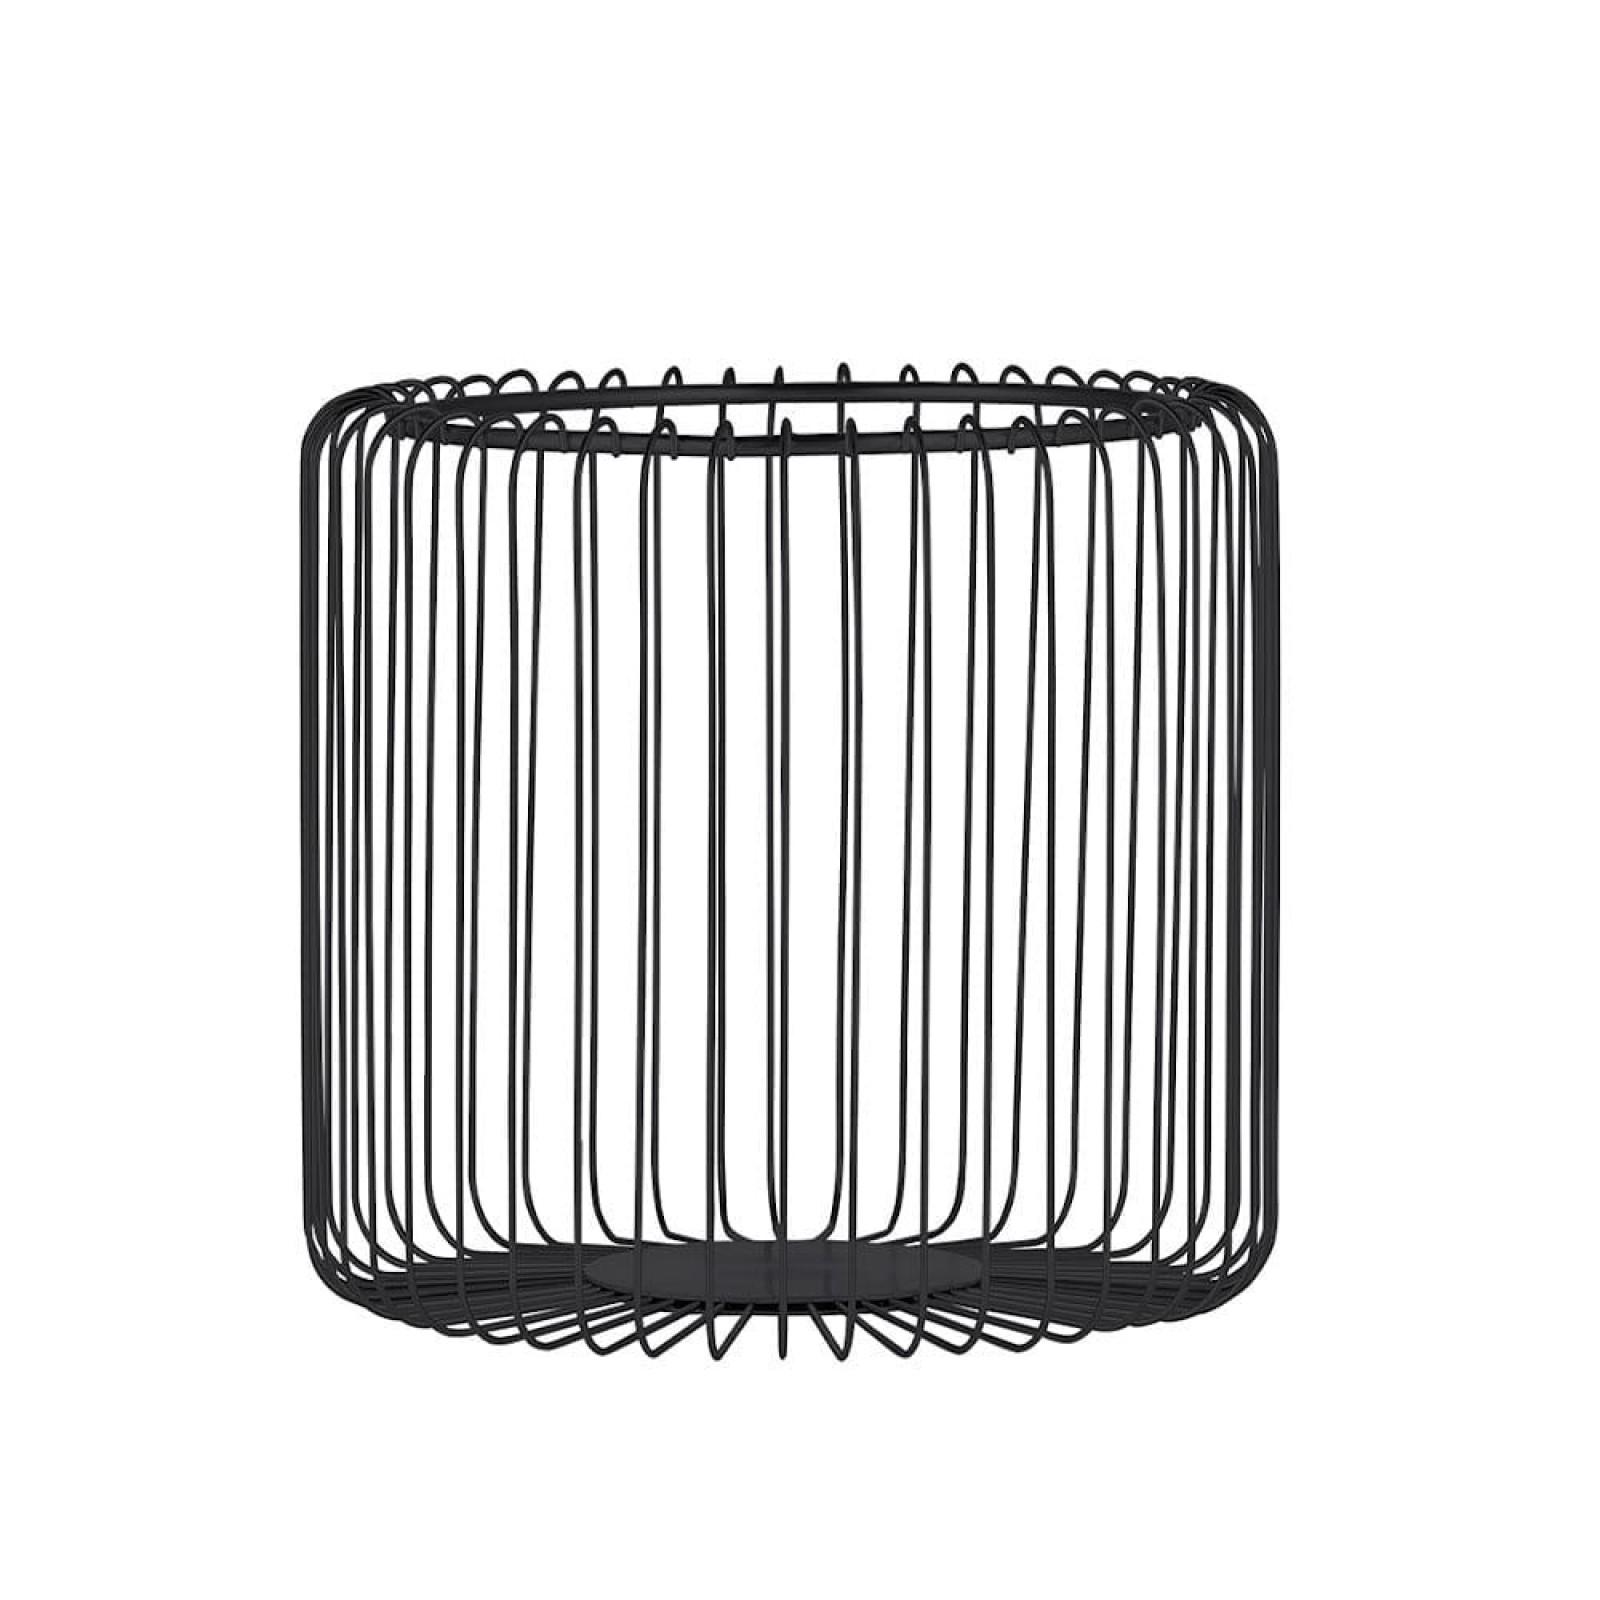 Estra Wire Basket / Fruit Bowl L (Black) - Blomus